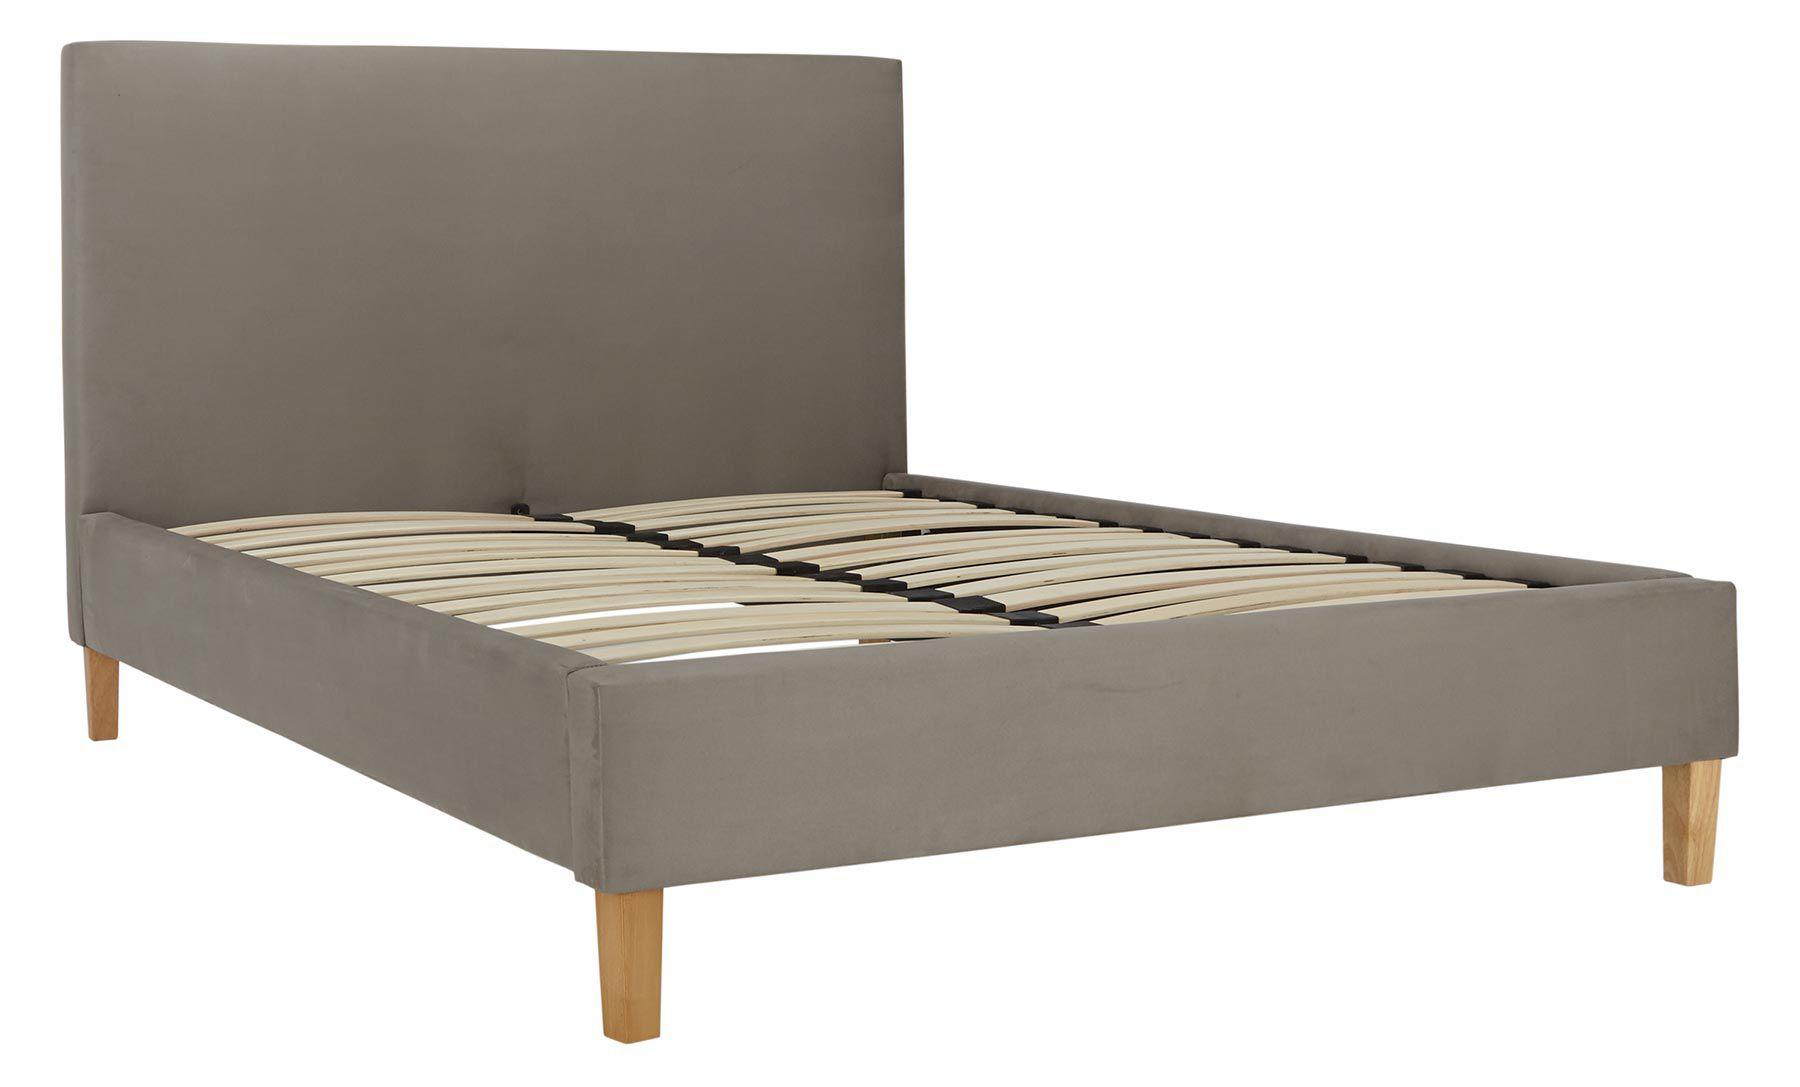 Brilliant Choosing The Ideal Bed Beatyapartments Chair Design Images Beatyapartmentscom